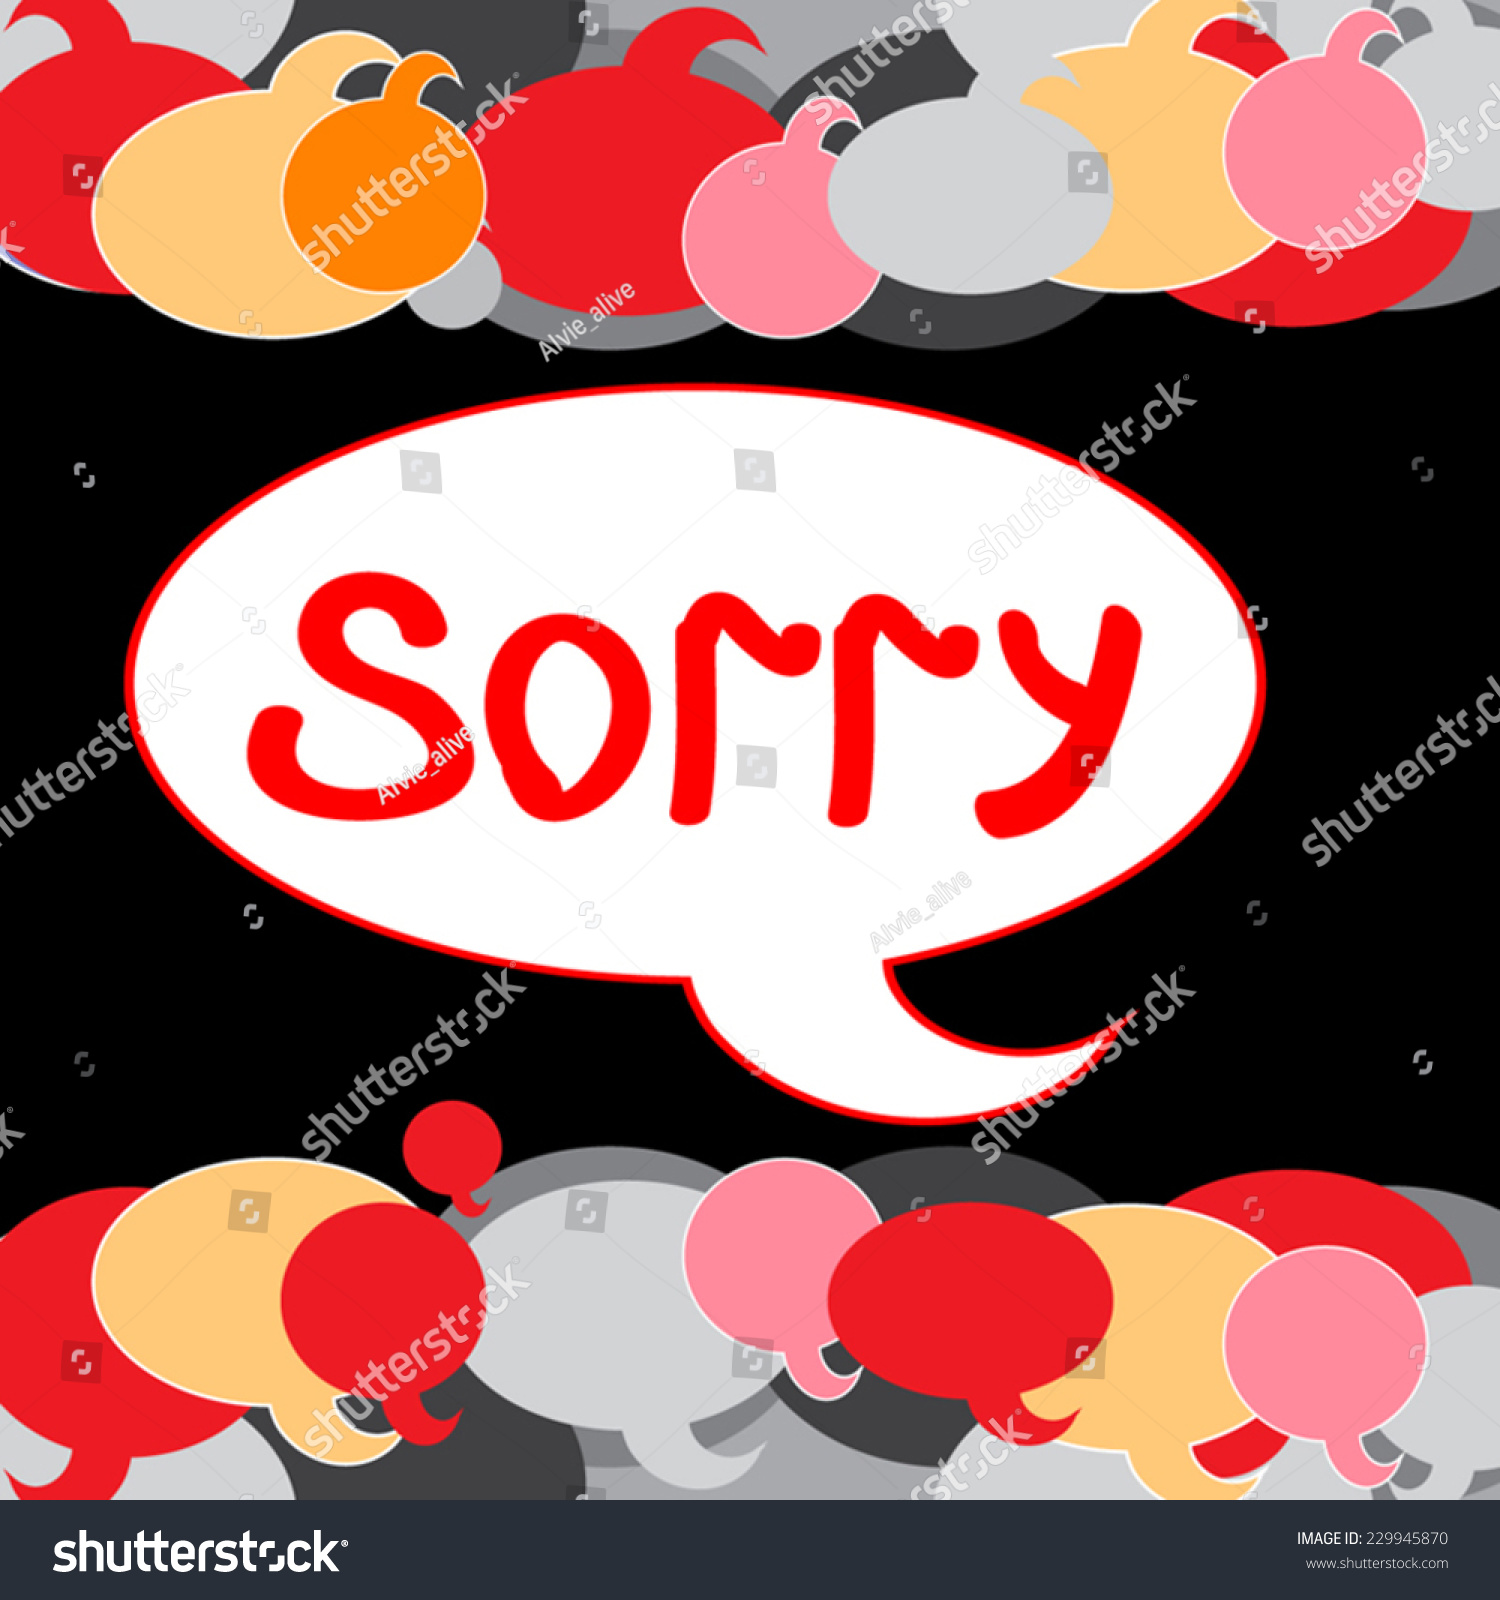 sorry vector illustration hand written text stock vector (royalty